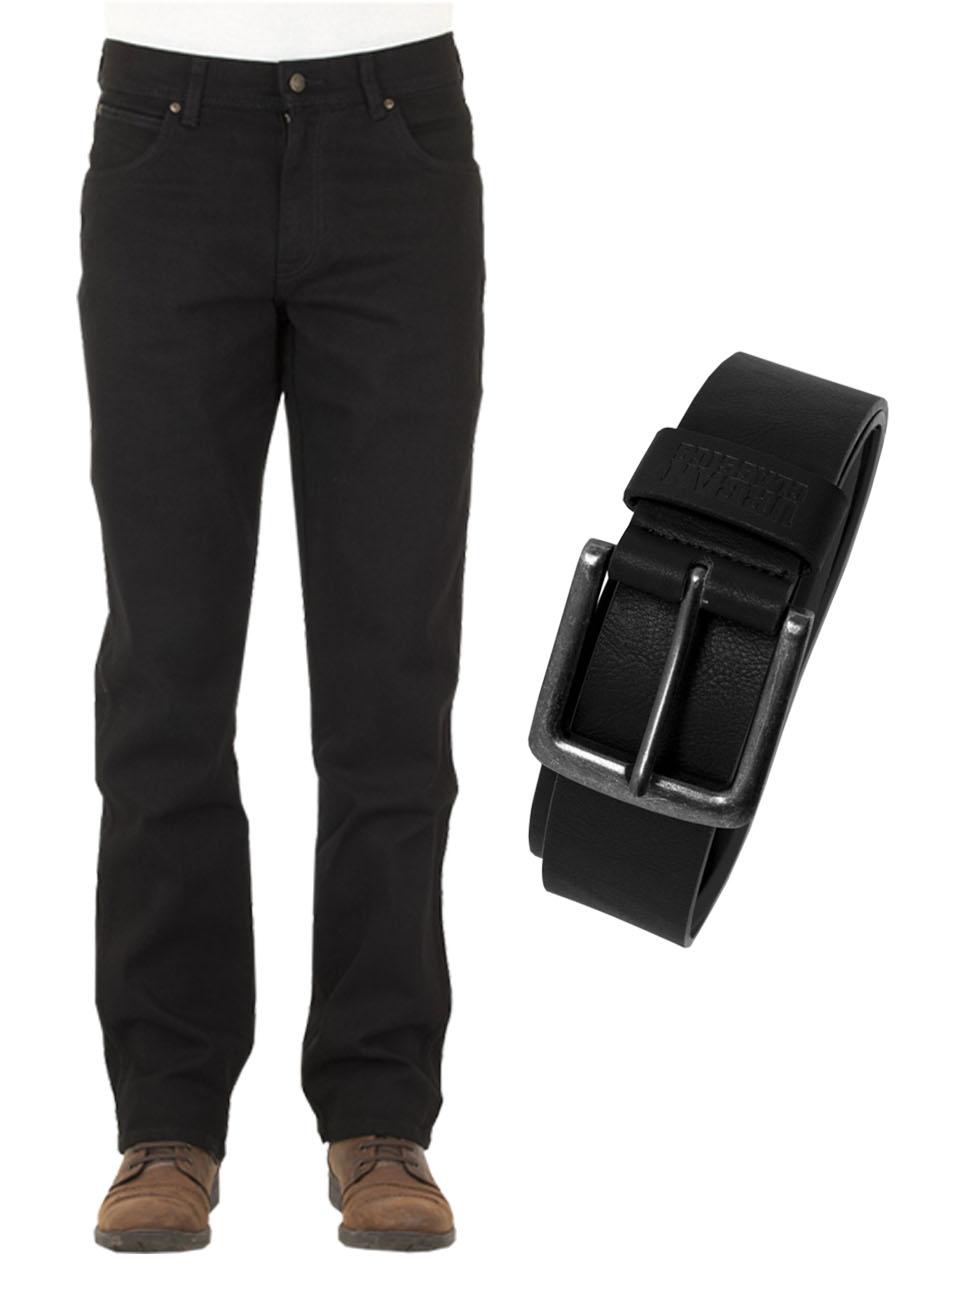 908772fccc4a Wrangler Herren Jeans Durable Stretch - Regular Fit mit Urban Classics  Gürtel